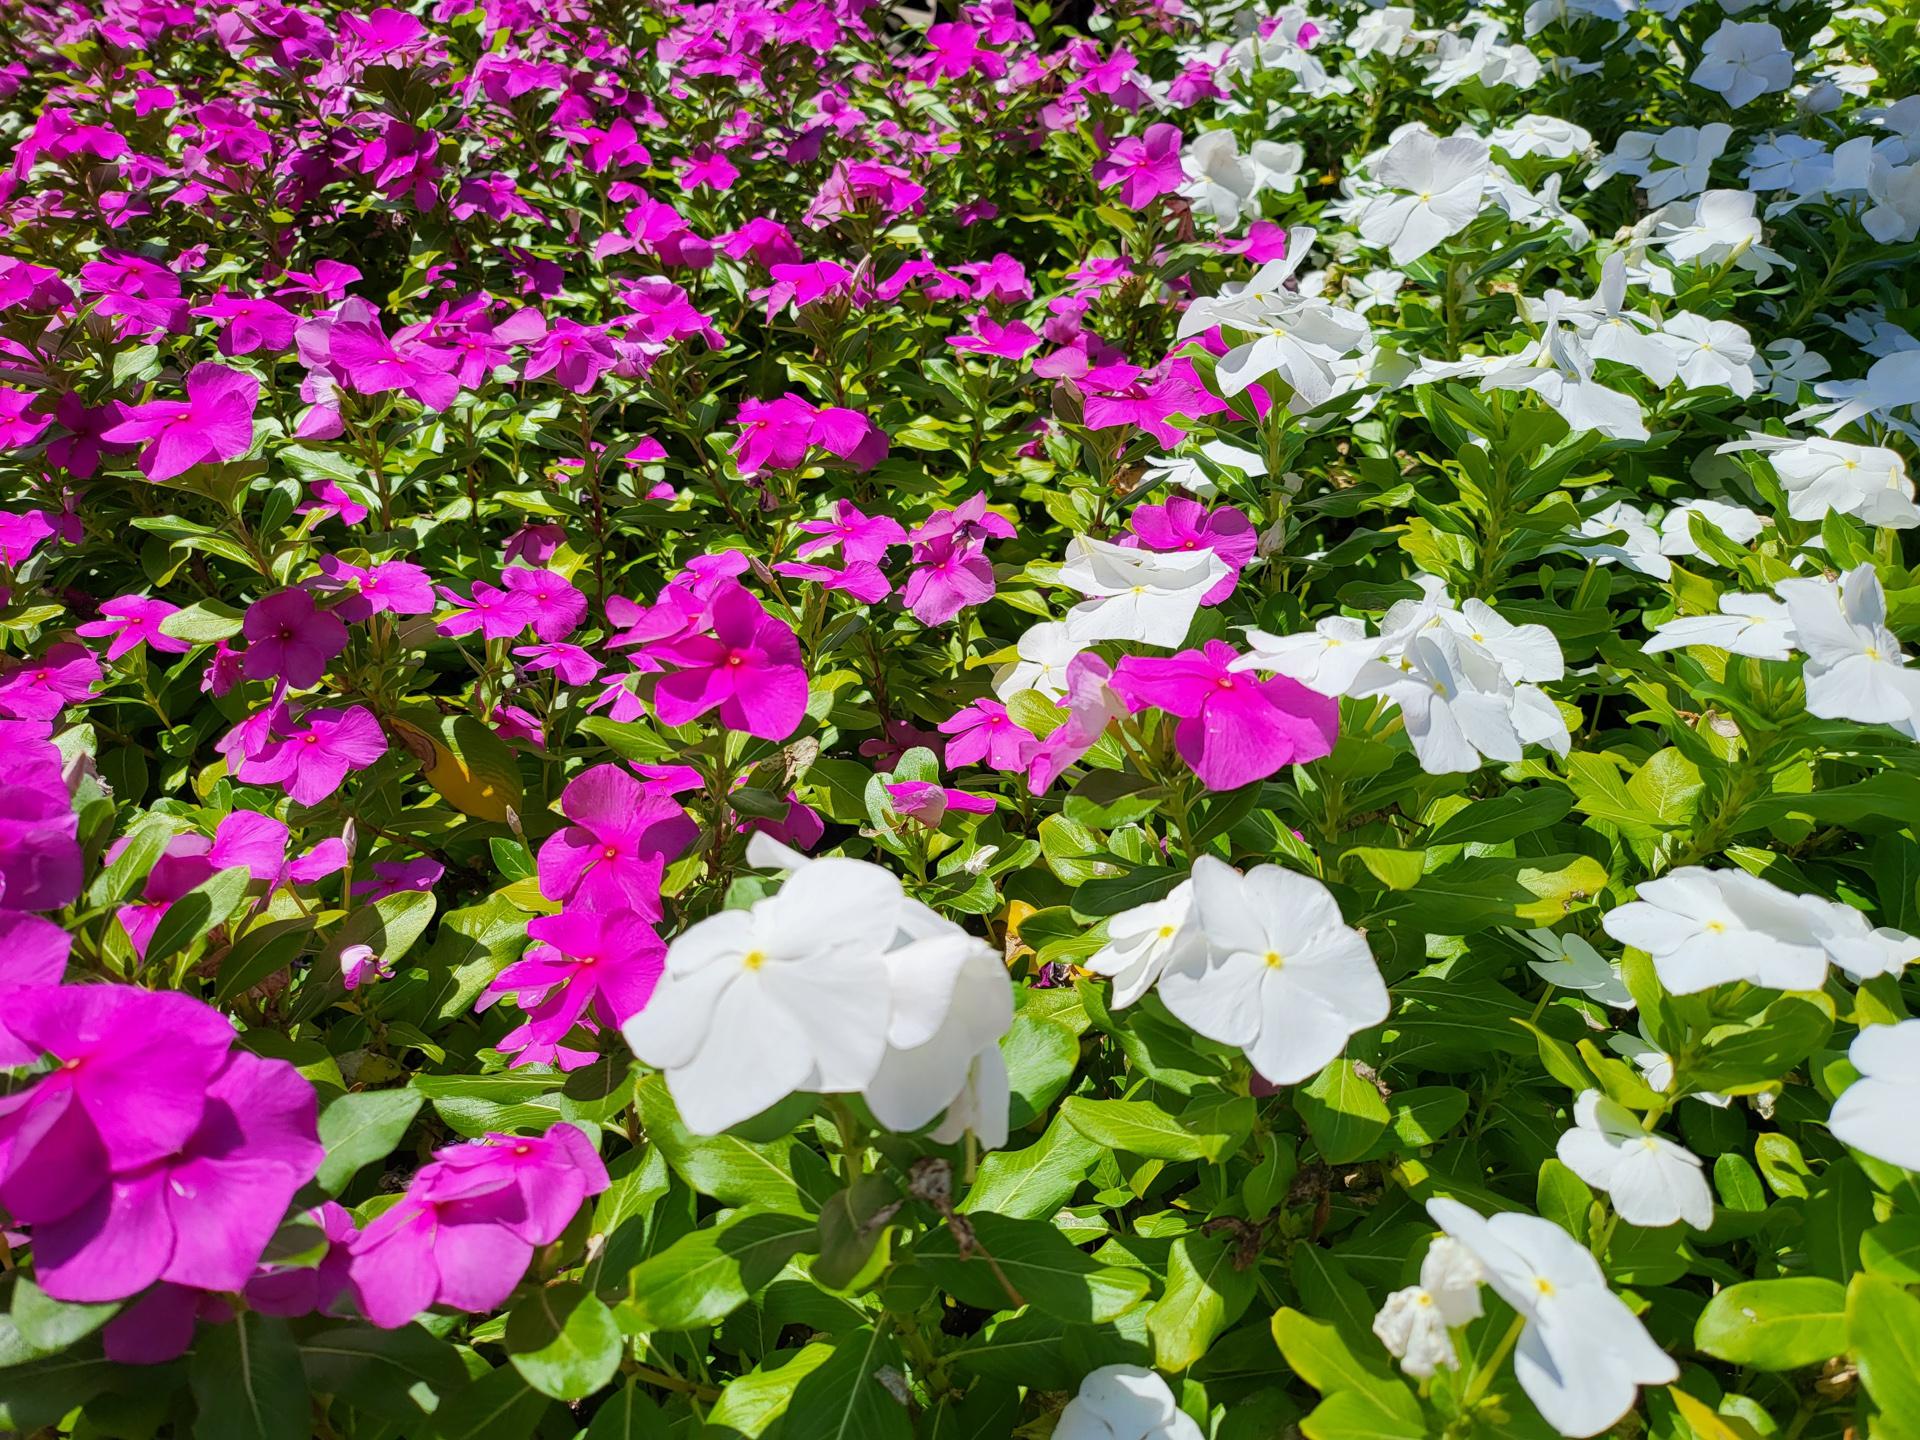 Samsung Galaxy Z Fold 3 photo sample white and purple flowers